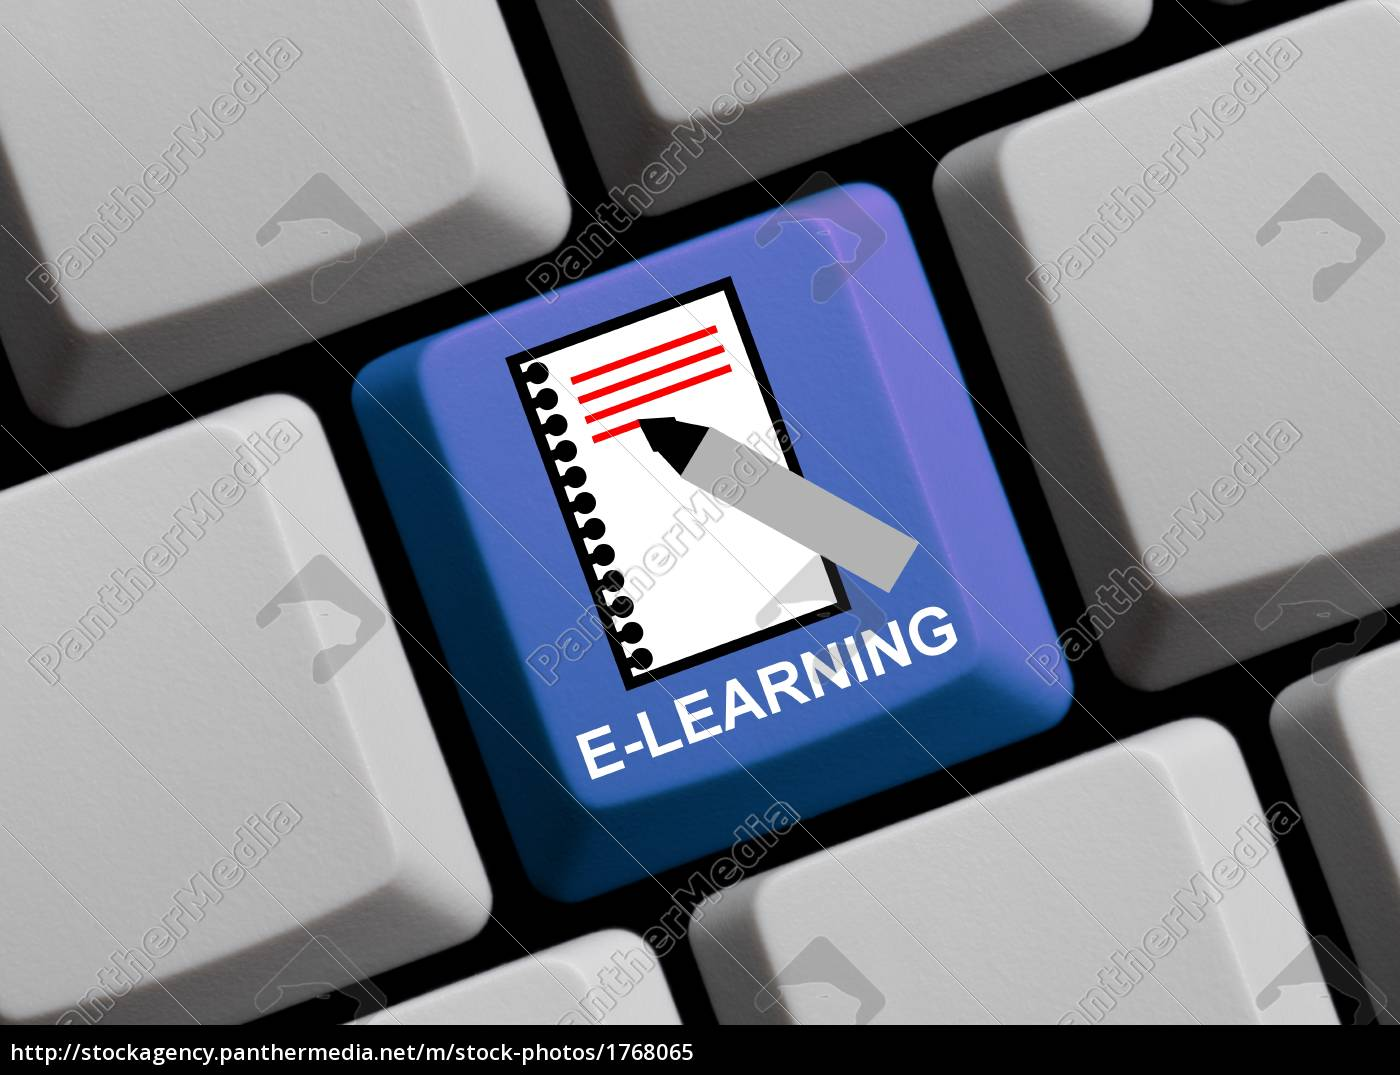 e-learning, -, online, learning - 1768065